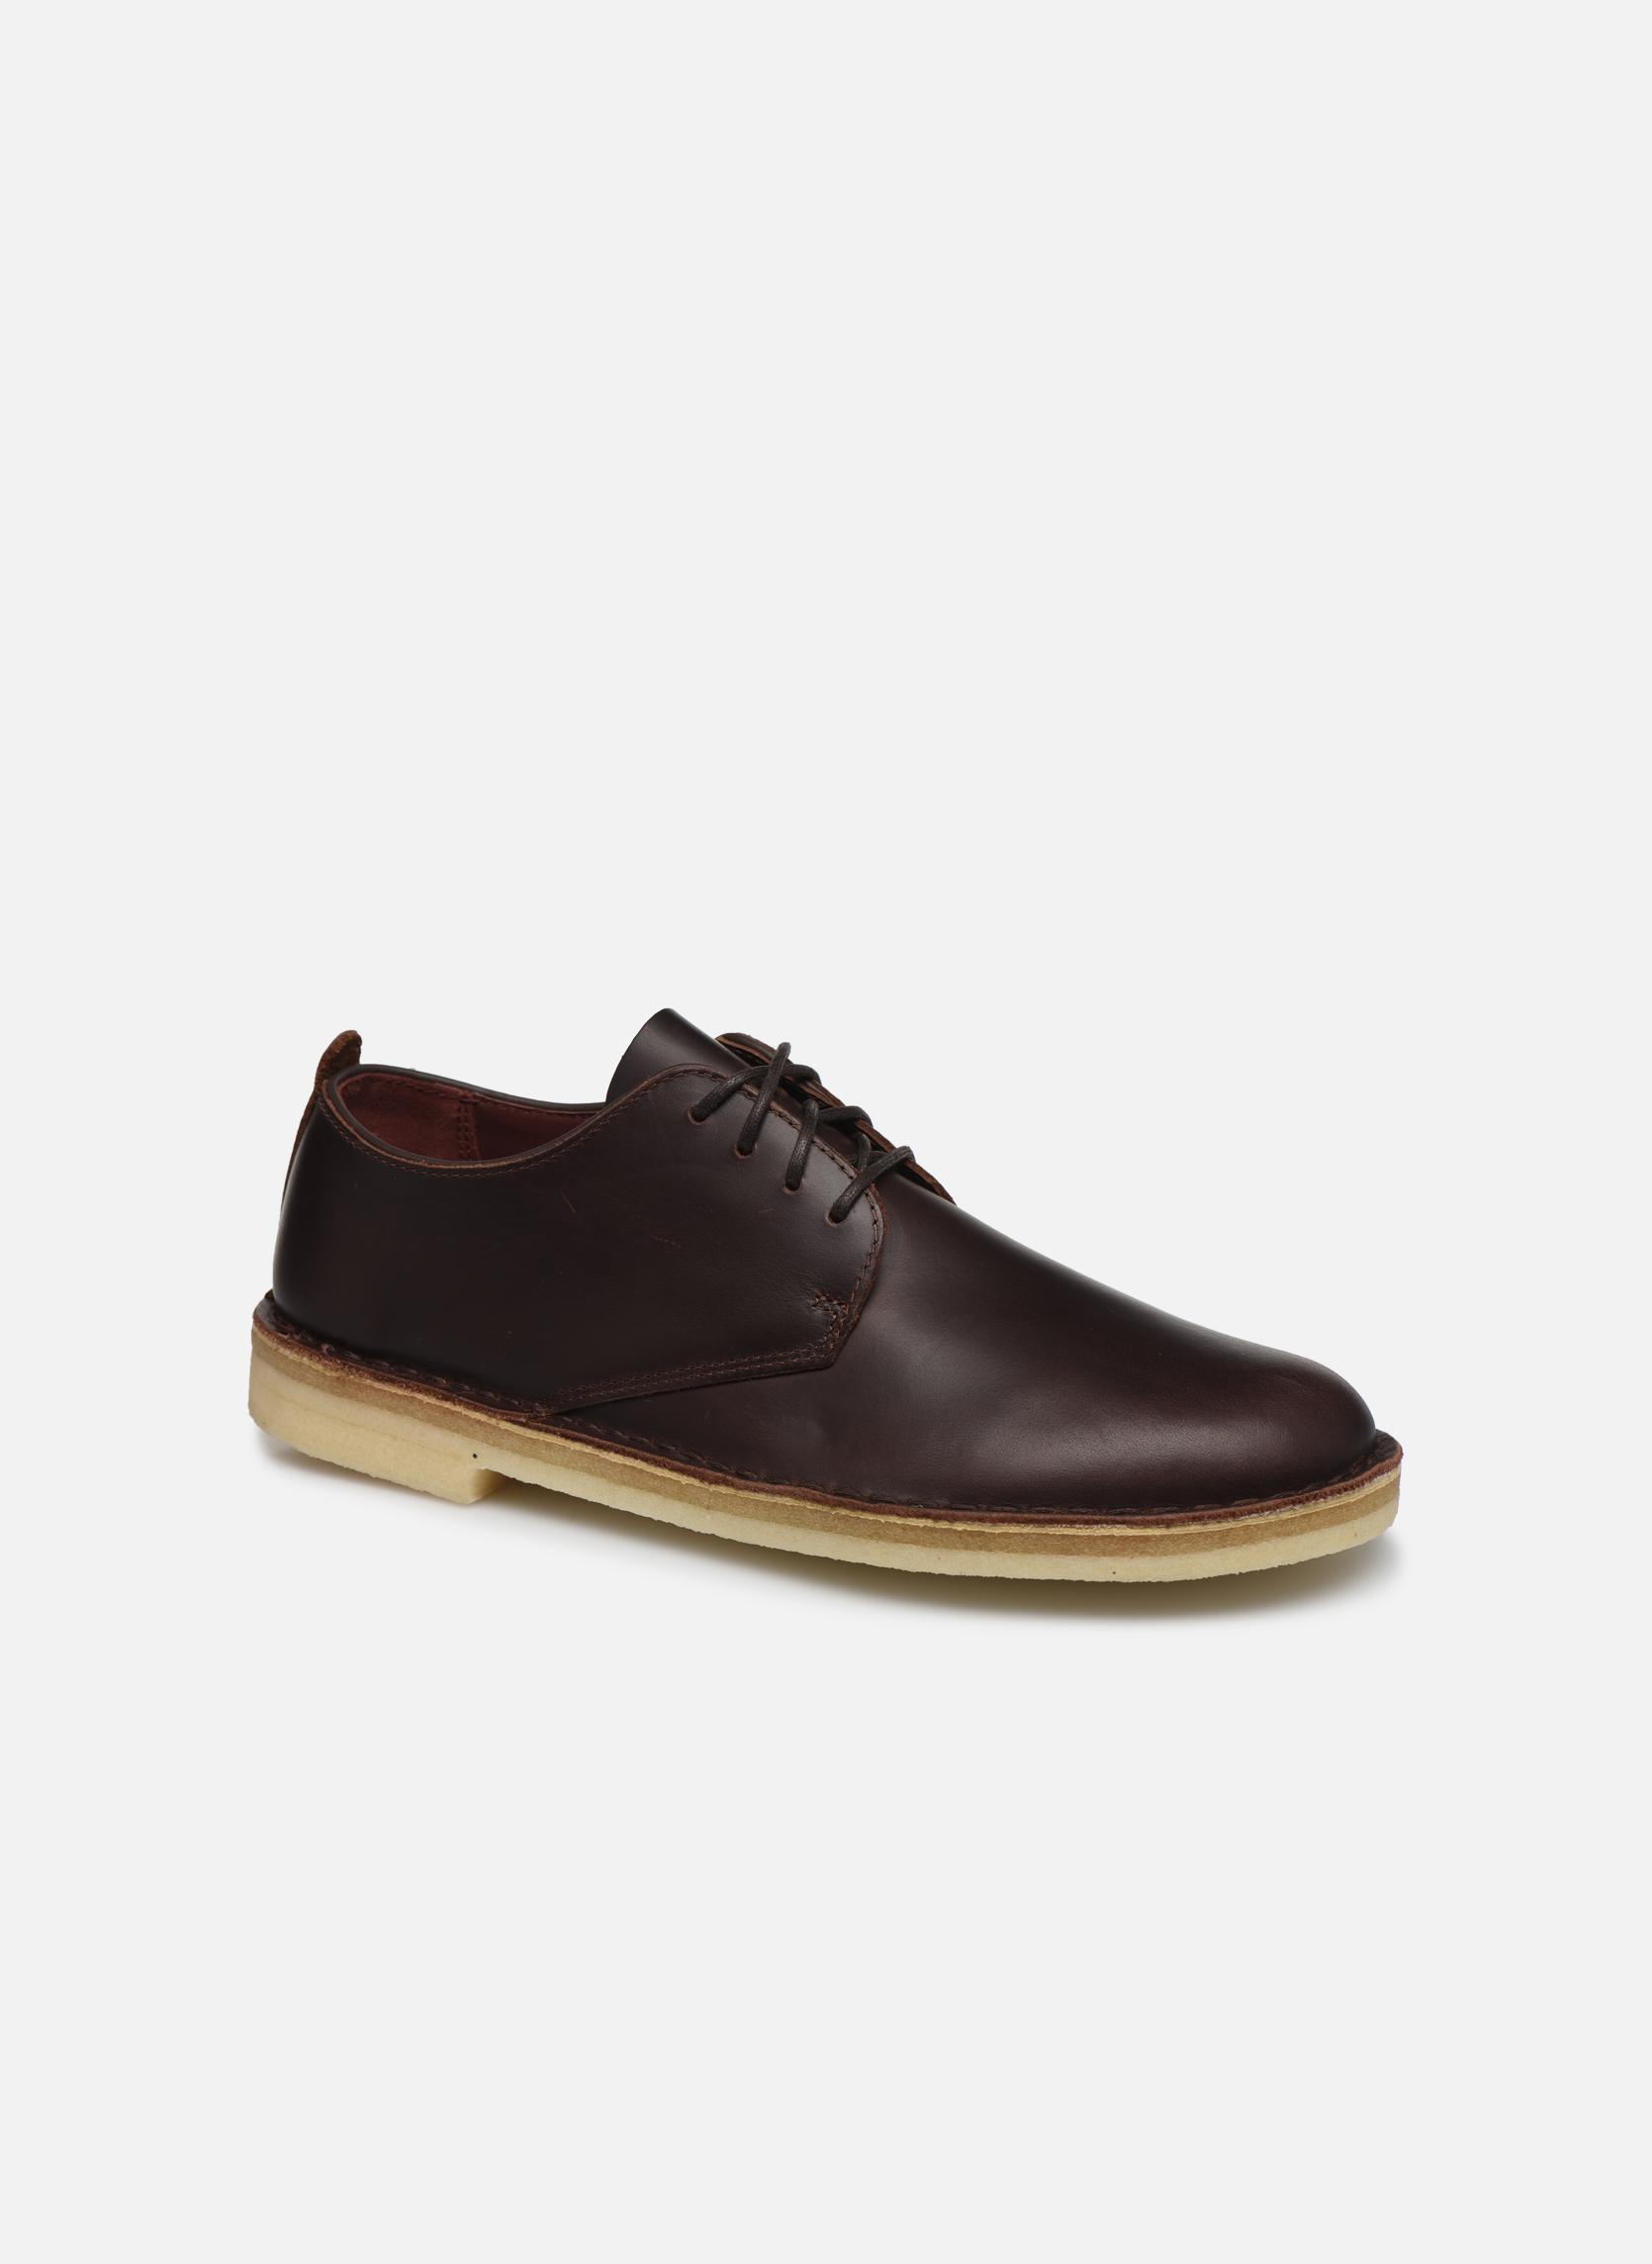 Chesnut leather